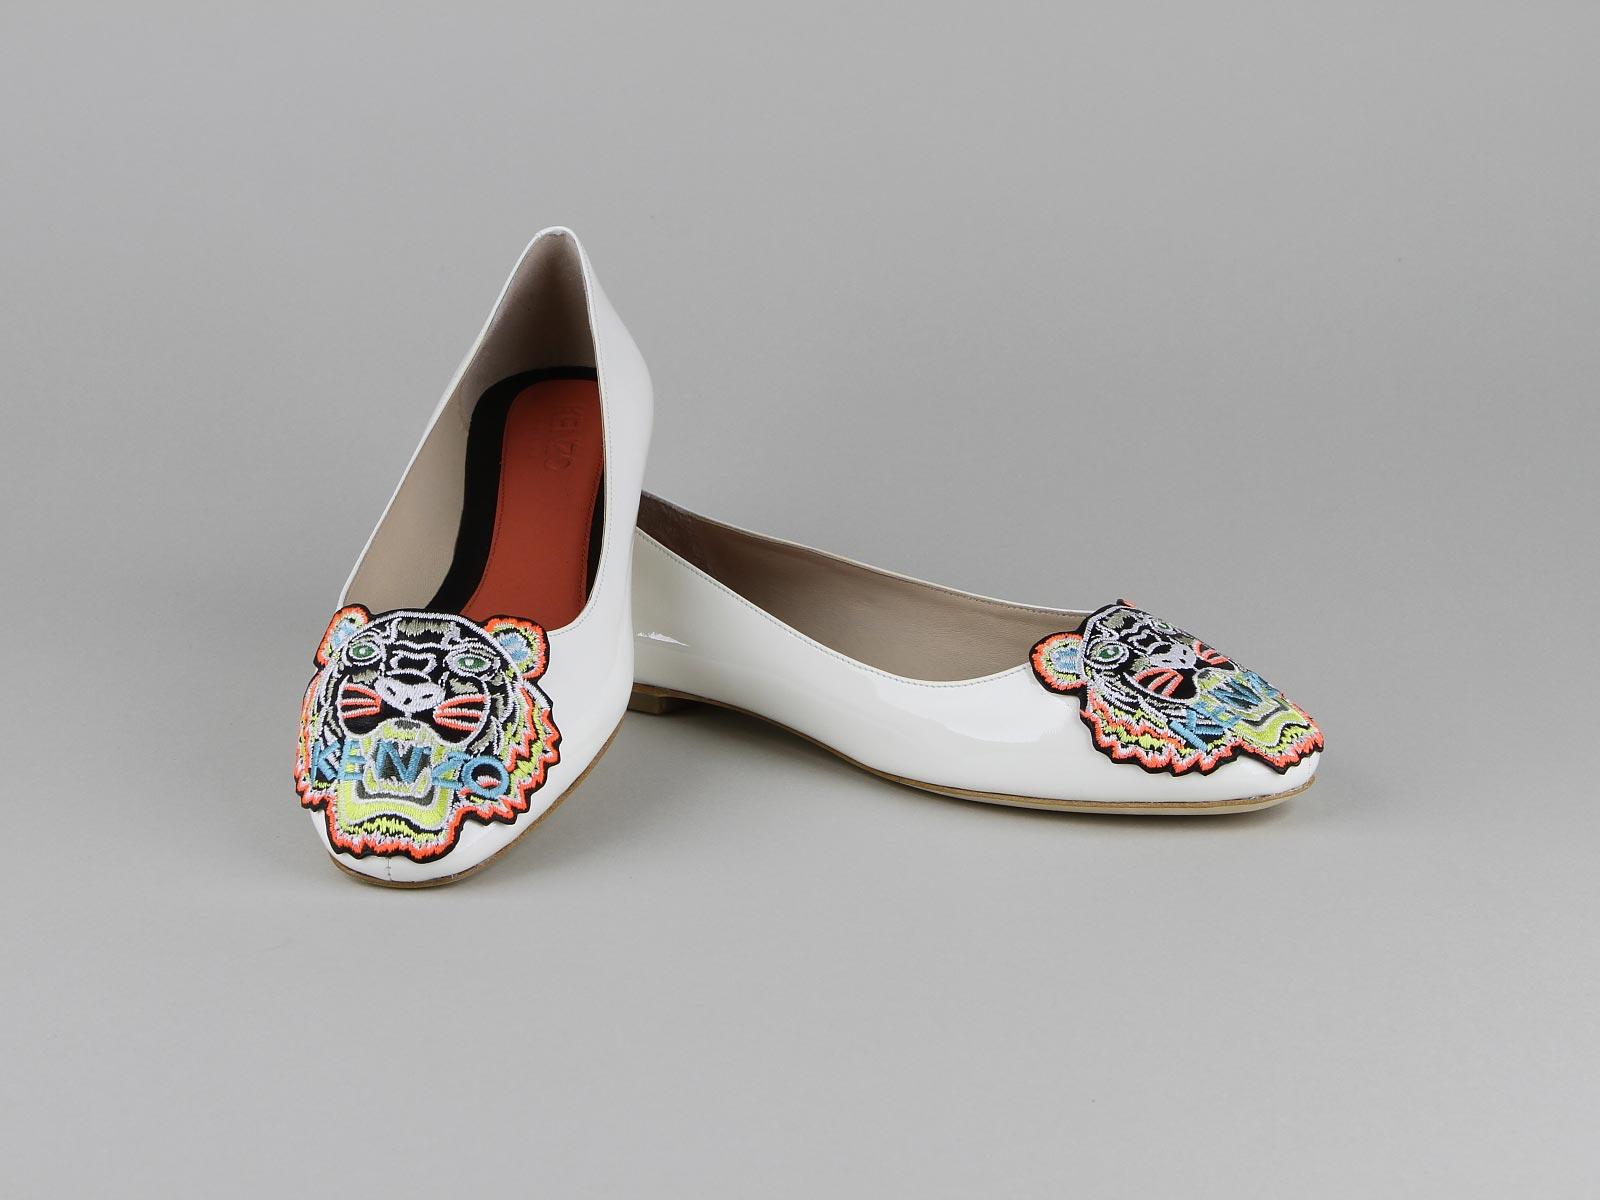 chaussure femme ballerine originale guide boutiques de mode guide shopping mode. Black Bedroom Furniture Sets. Home Design Ideas